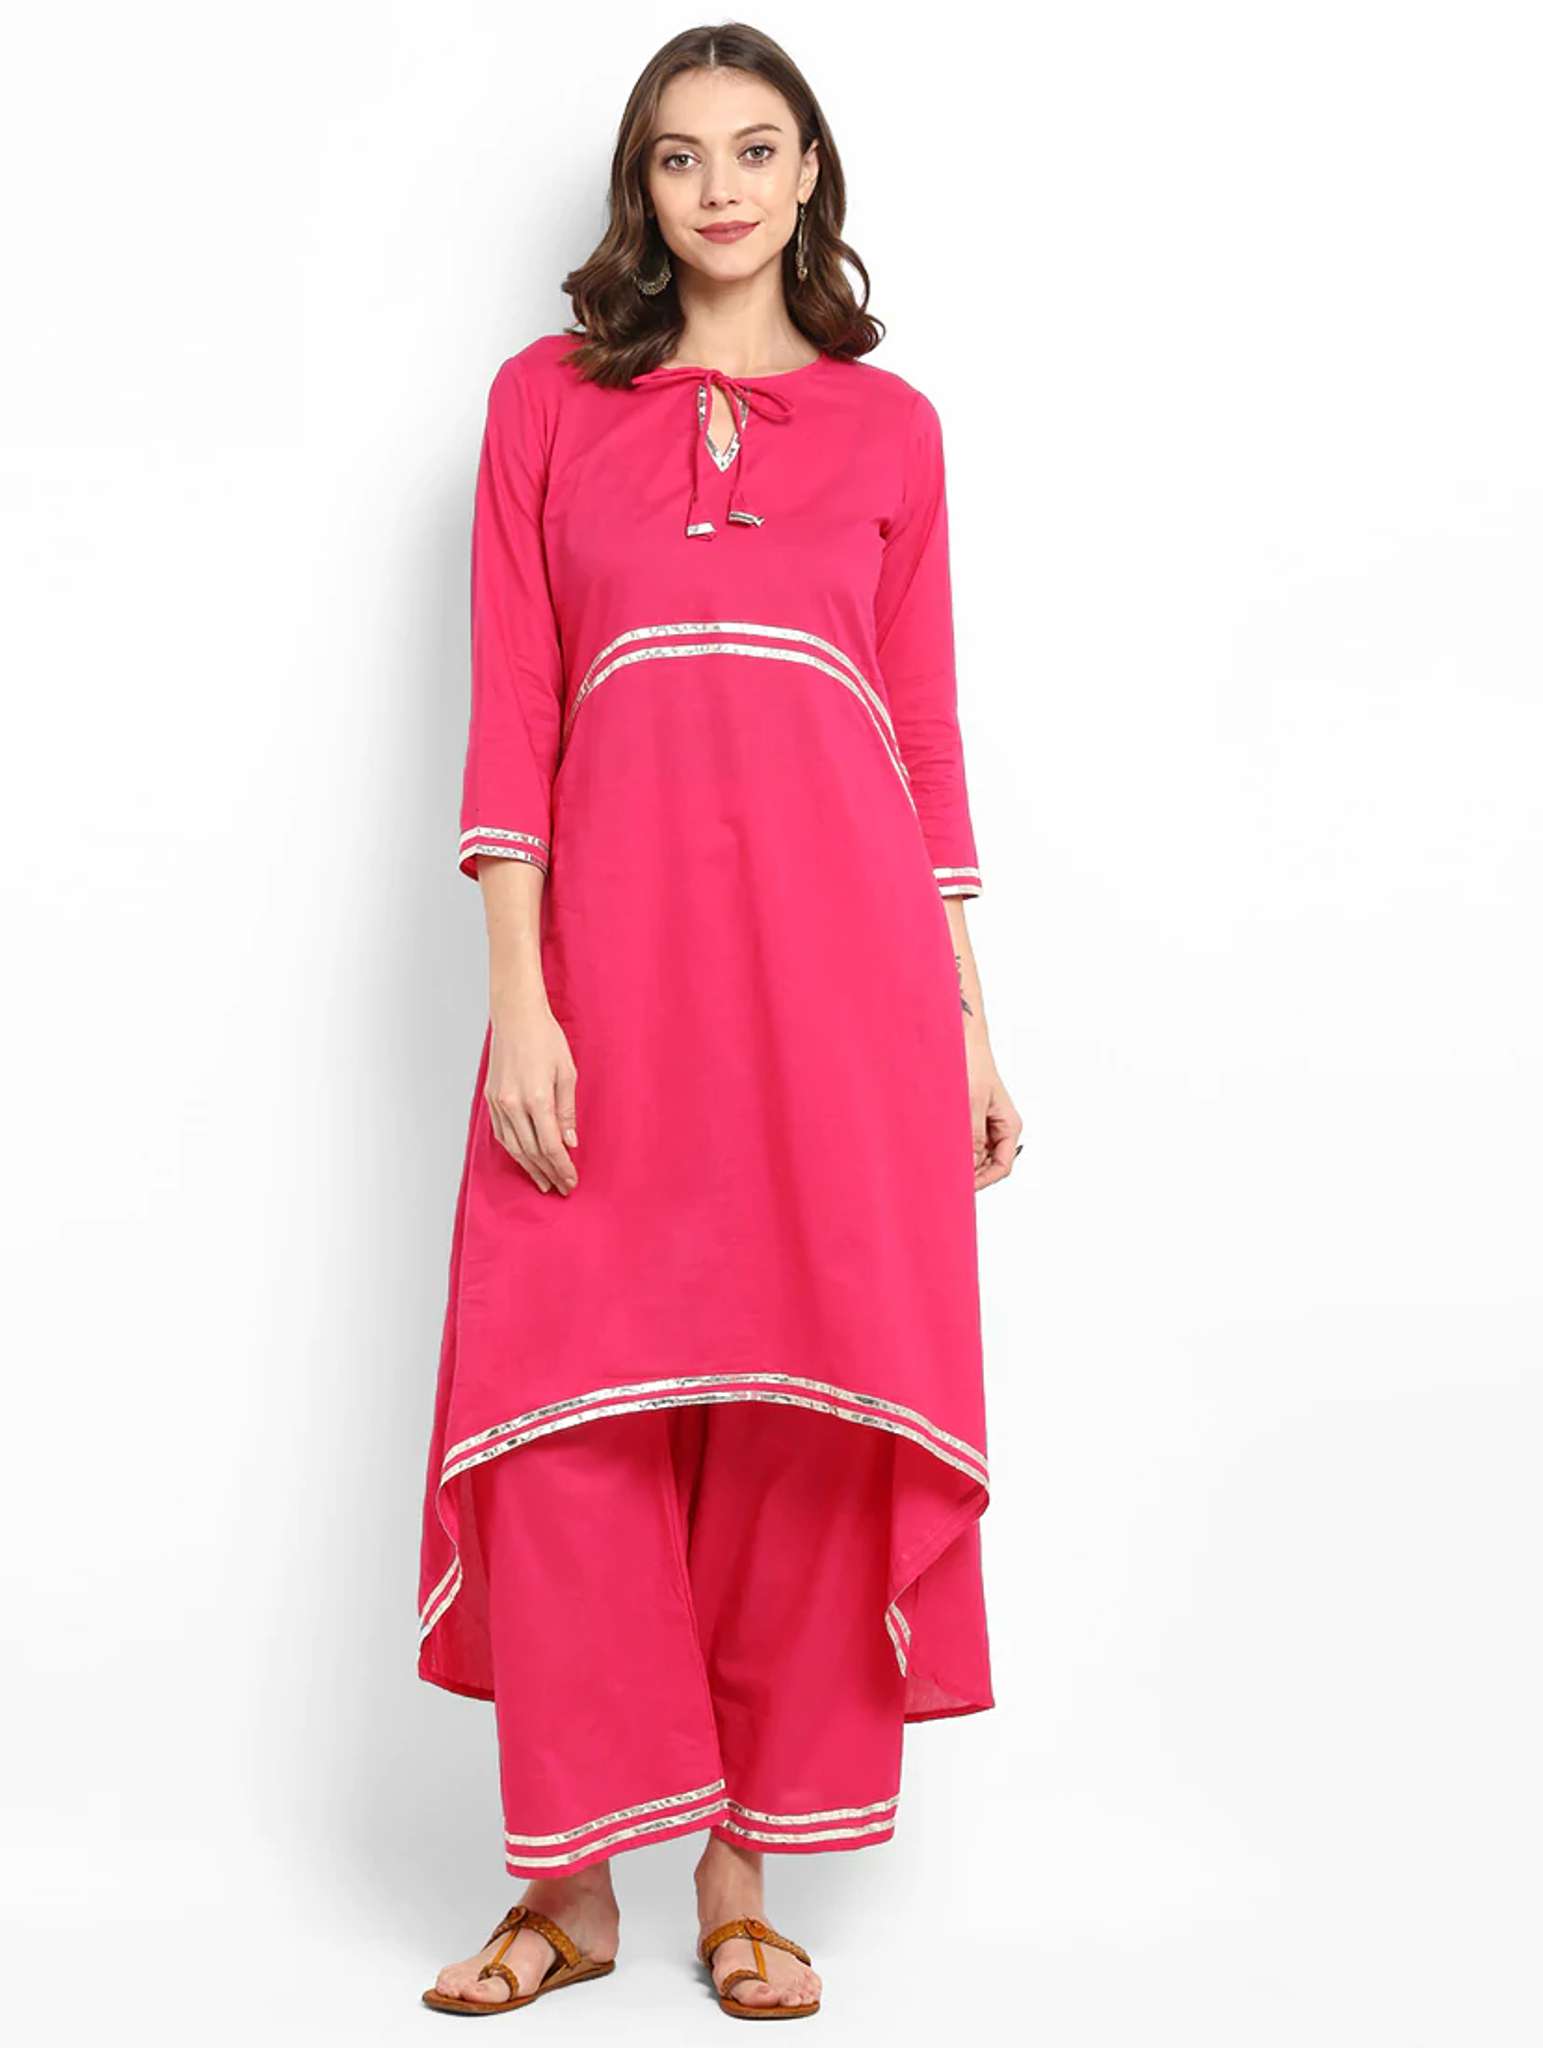 Lemon Tart Clothing Women's LTS11 Lace Detail Kurti and Pants Sets - Bright Pink